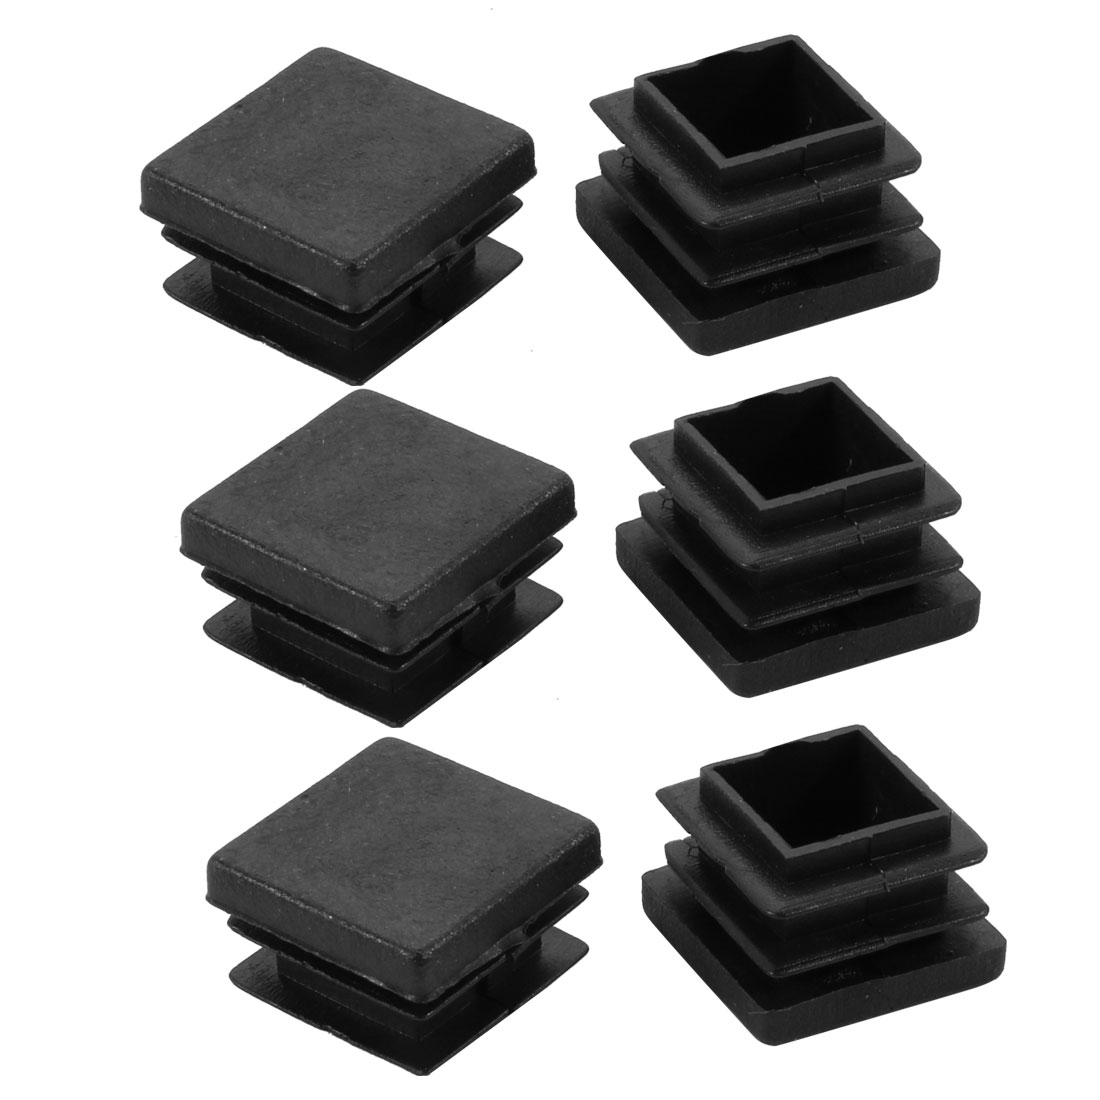 6pcs 22x22mm Black Plastic Square Cabinet Chair Leg Floor Insert Cover Protector